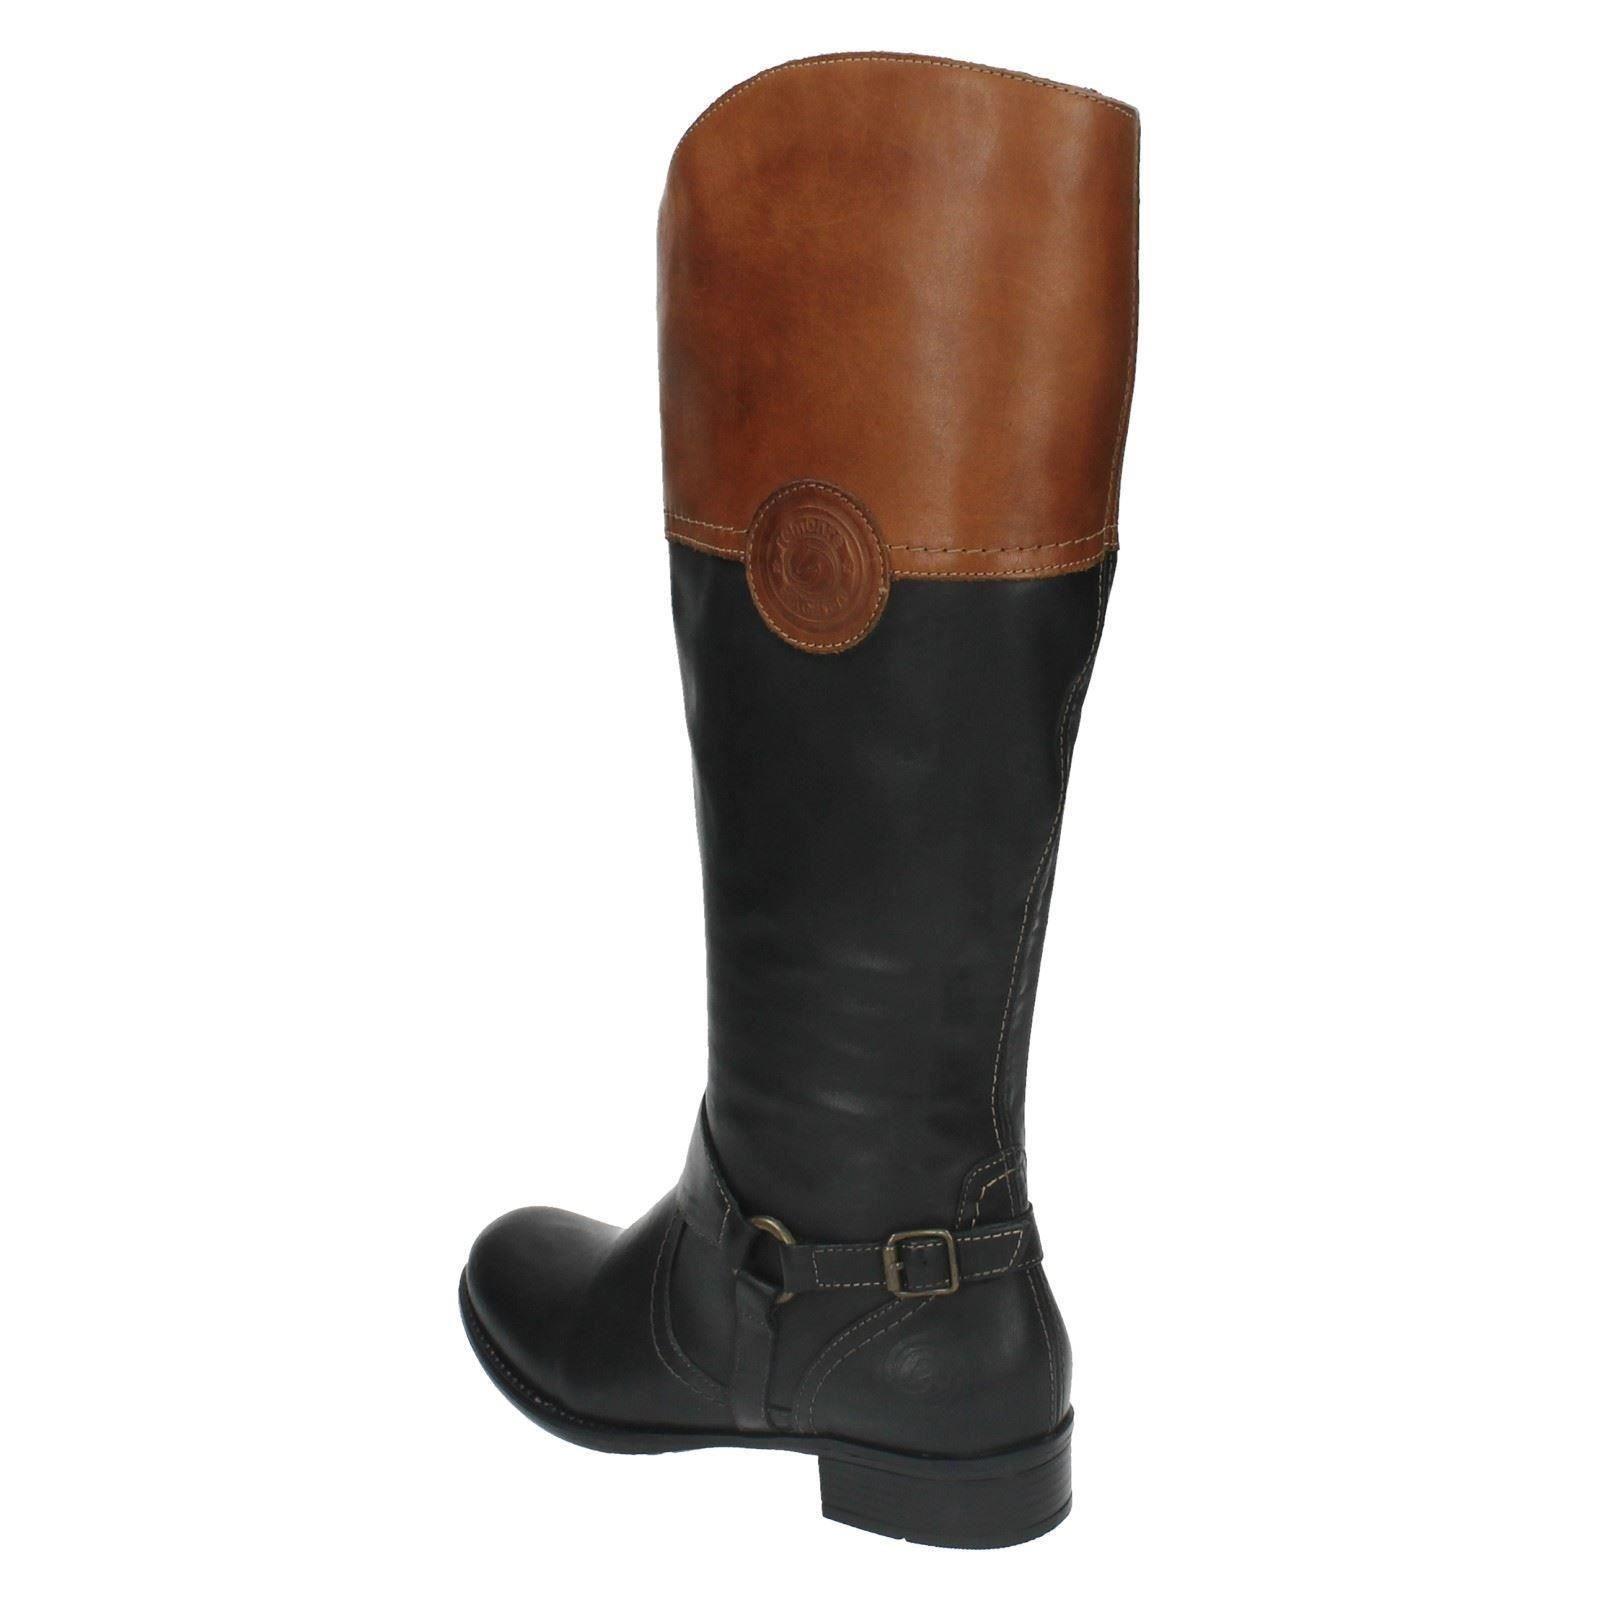 Remonte 'r6474' Combi Black black Boots Ladies Knee High dnSqIdA